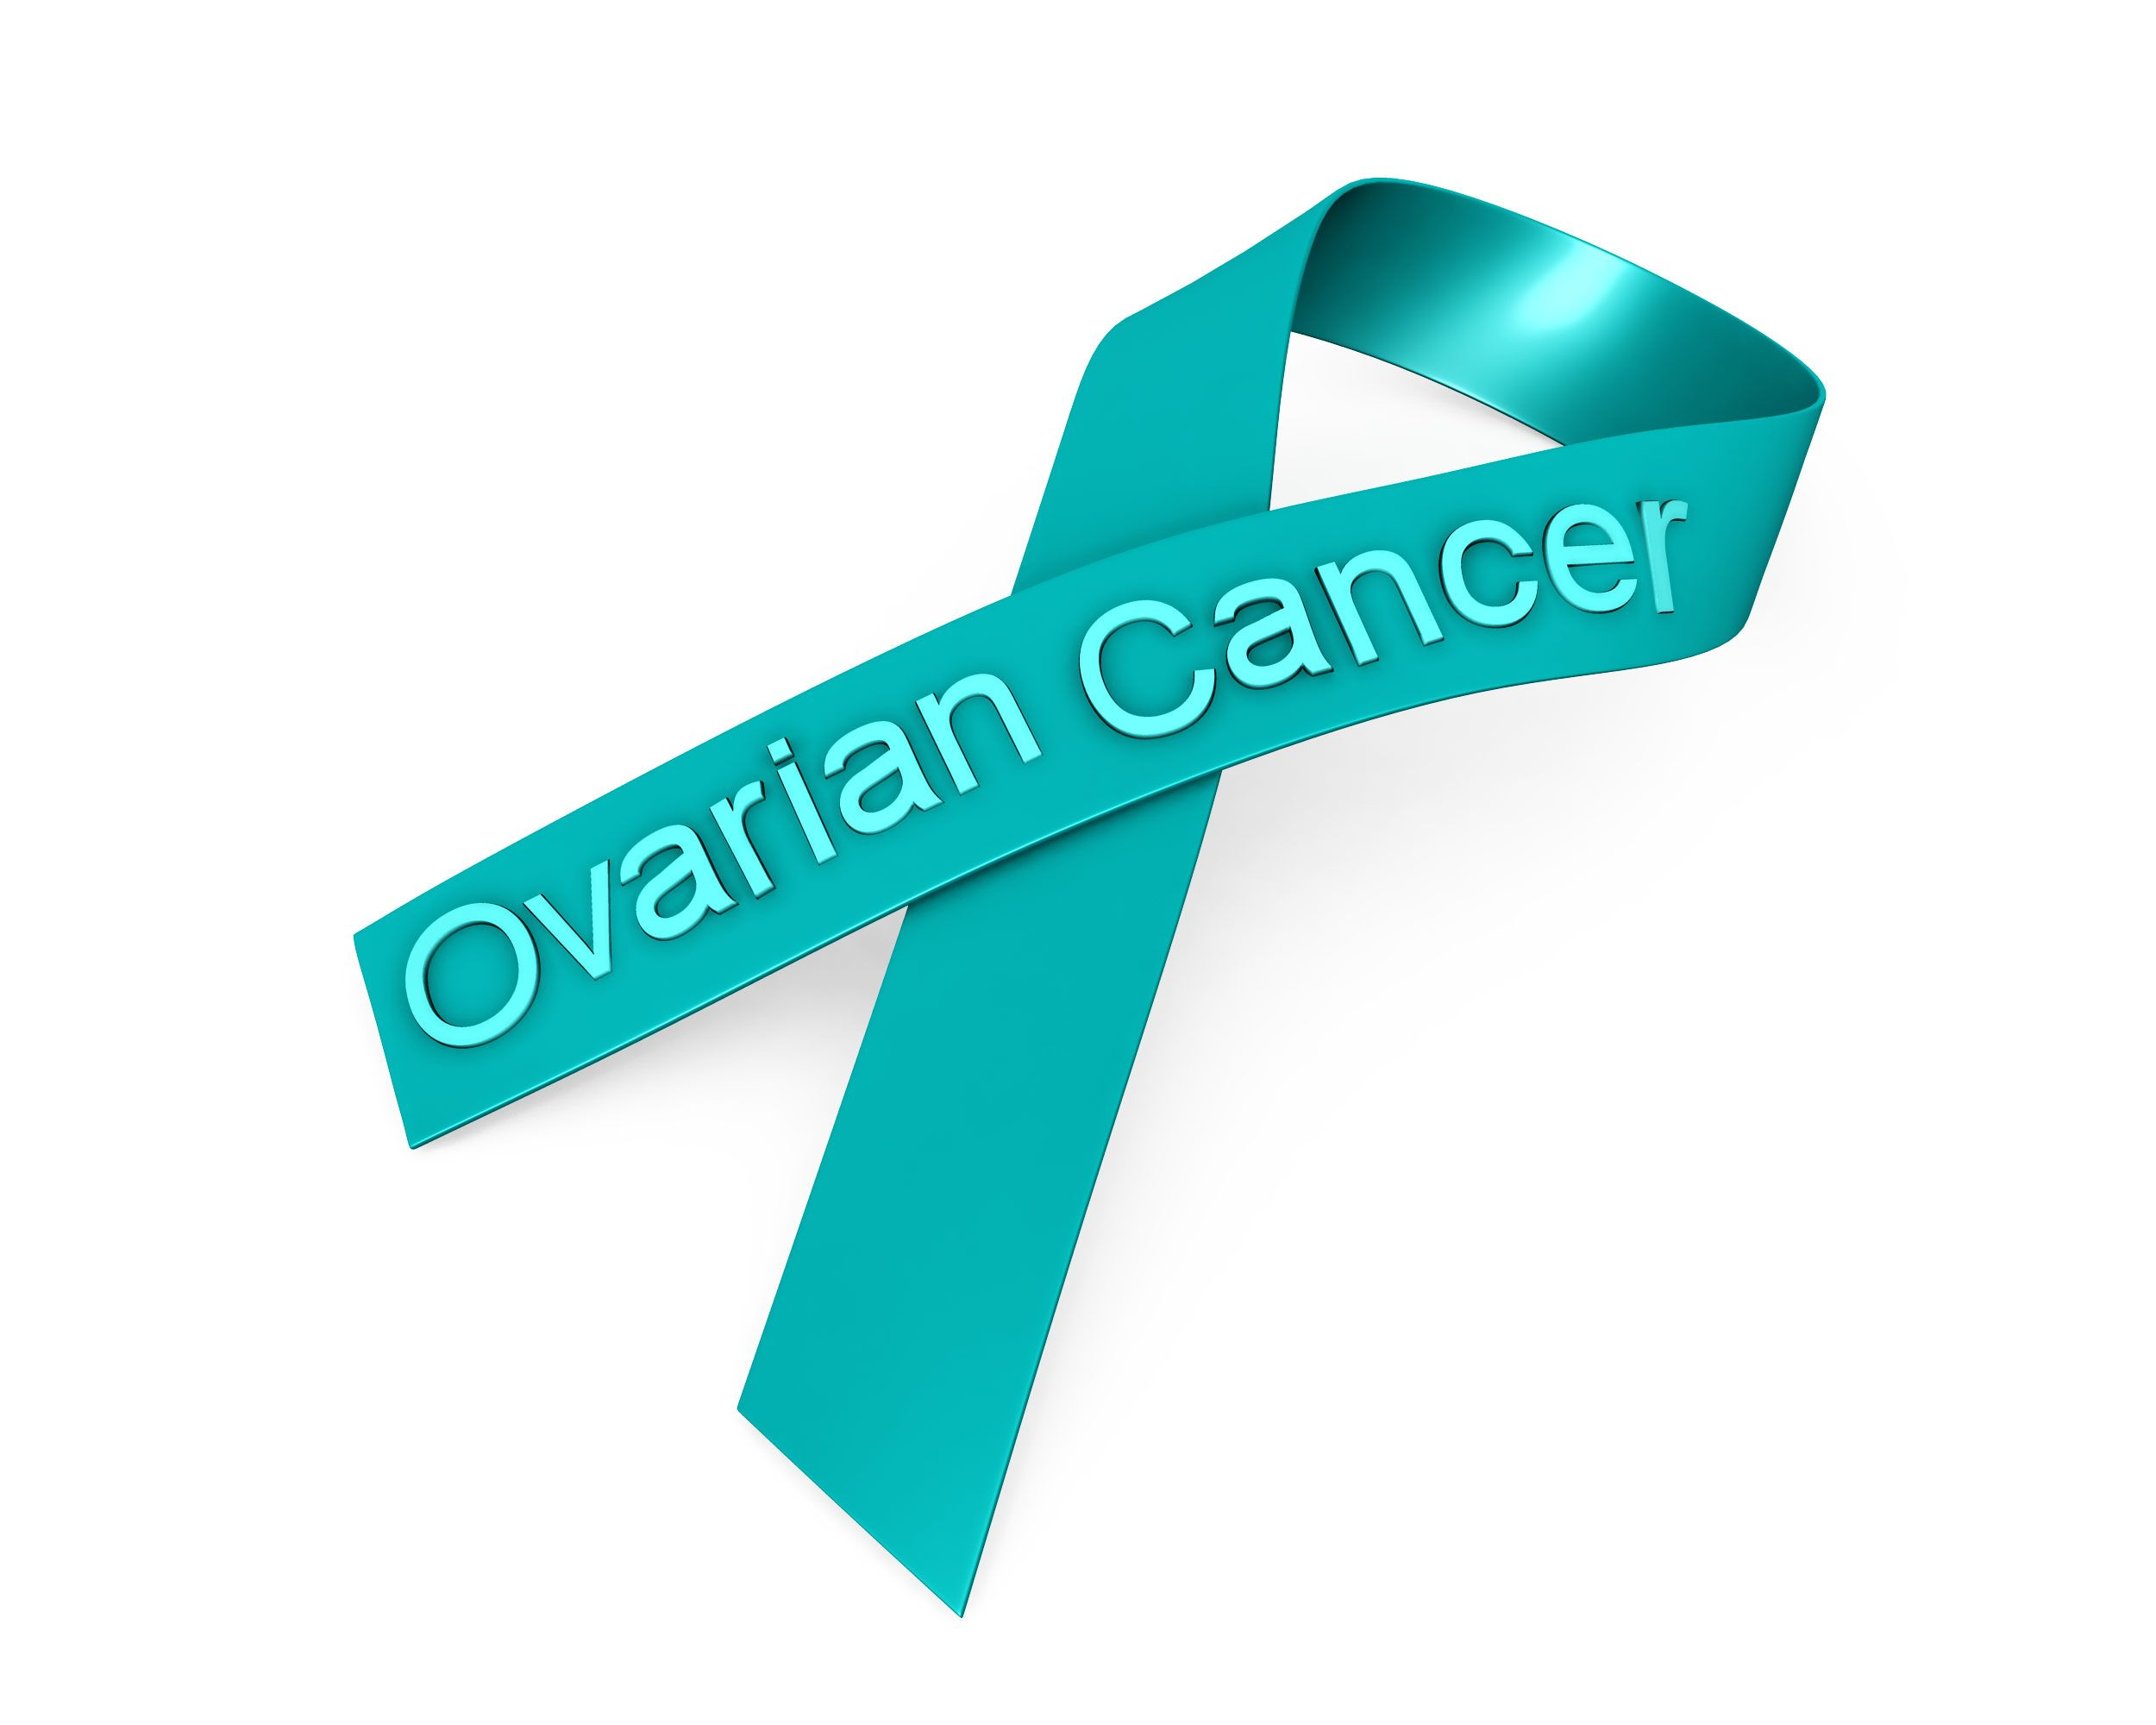 0914_green_ribbon_for_ovarian_cancer_awareness_stock_photo_Slide01